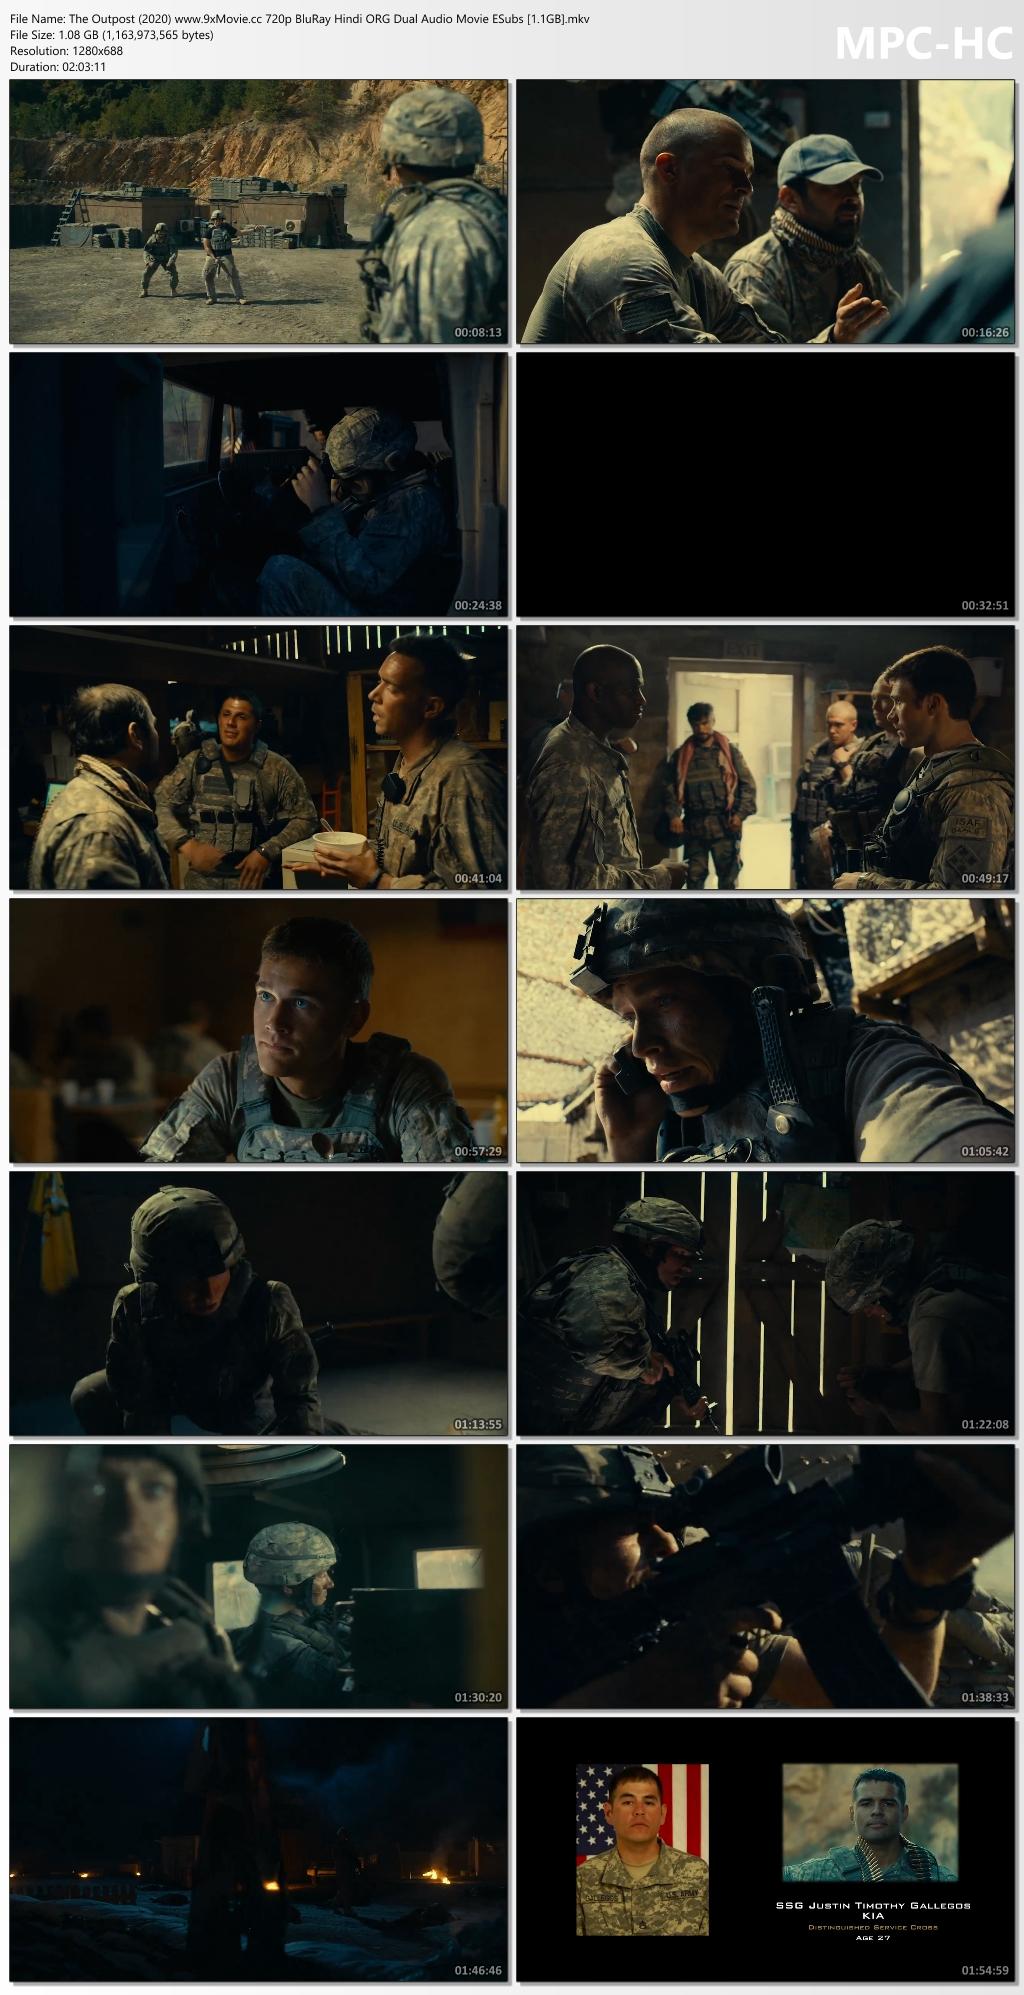 The-Outpost-2020-www-9x-Movie-cc-720p-Blu-Ray-Hindi-ORG-Dual-Audio-Movie-ESubs-1-1-GB-mkv